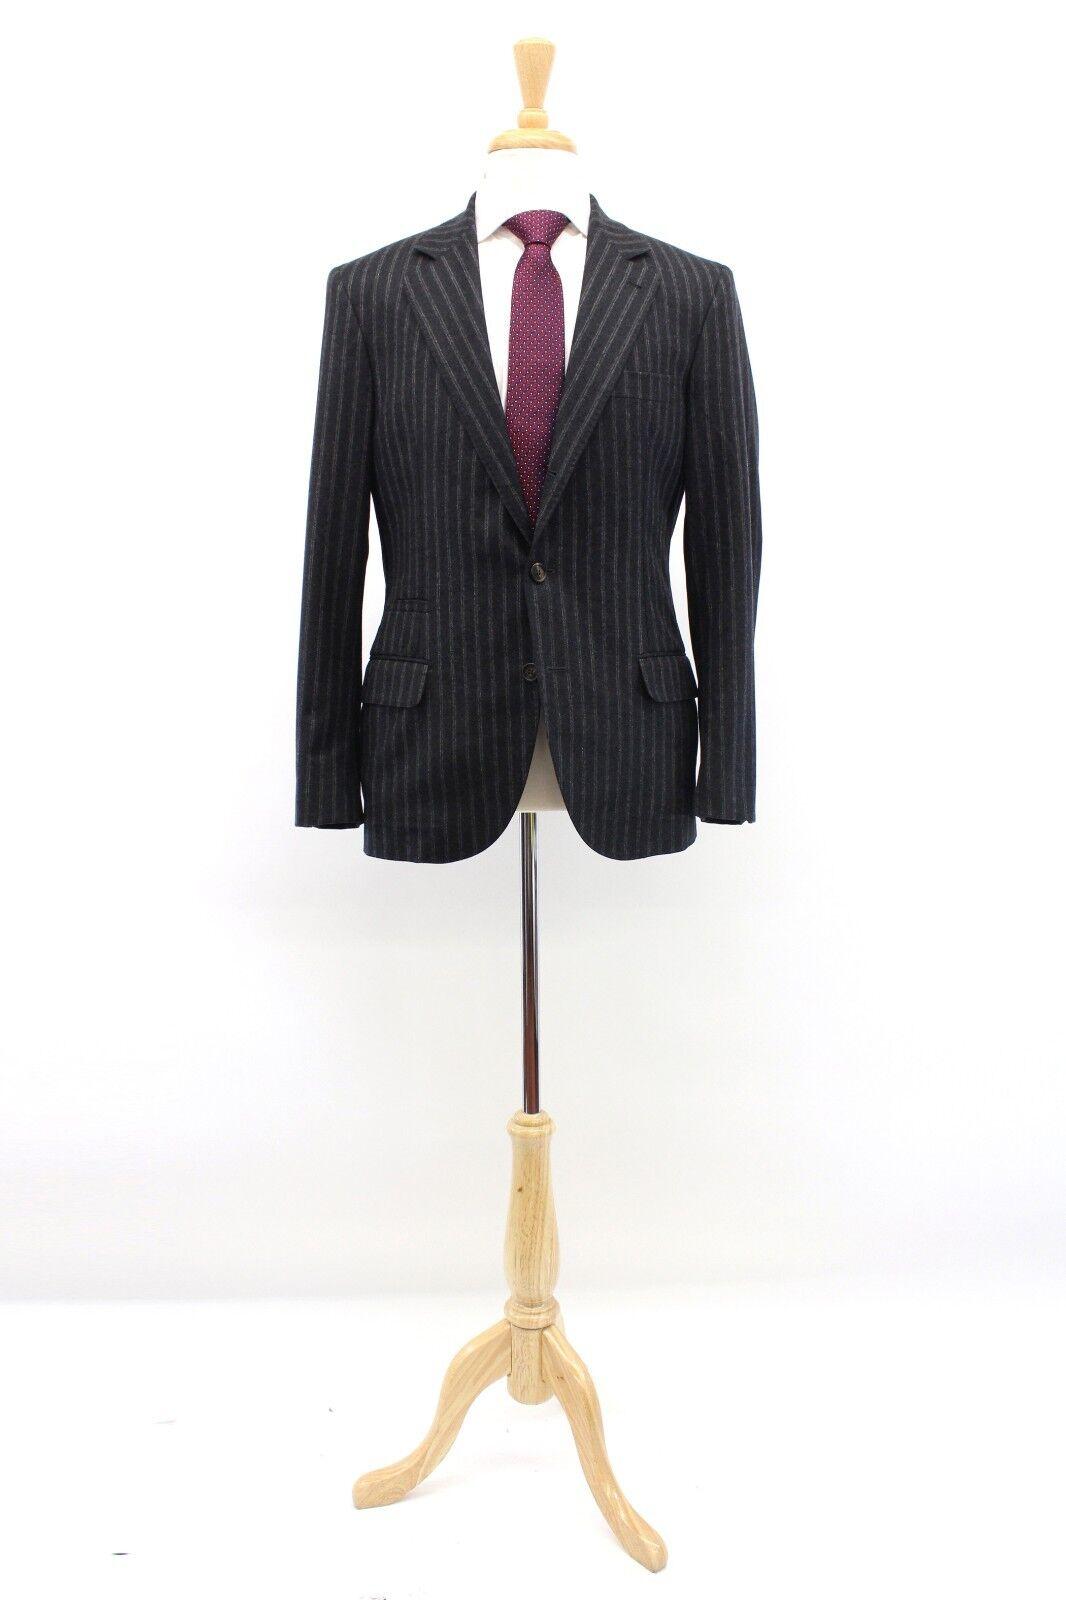 NWT4395 Brunello Cucinelli 100% Wool Knit Striped Logo Sport Coat 48/38 US A181